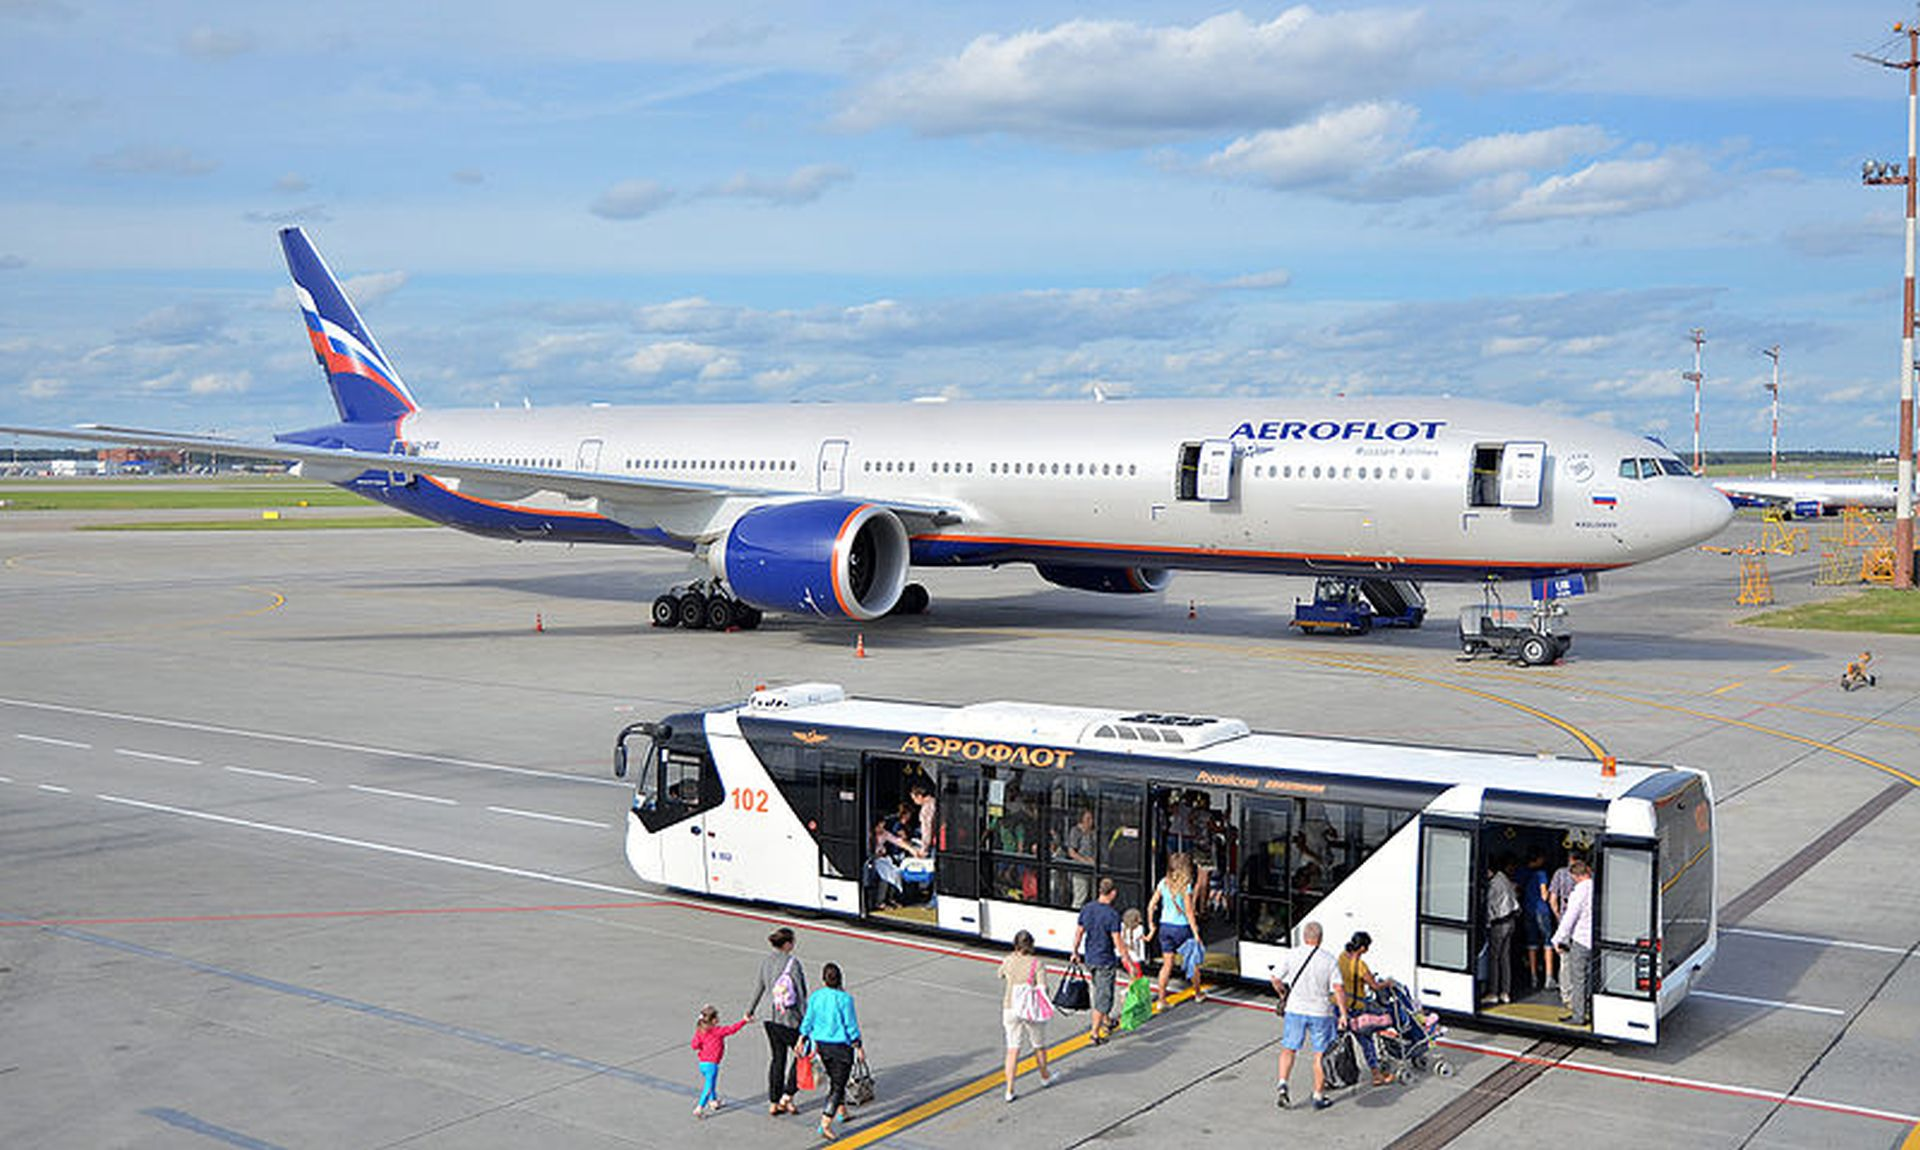 Boeing 777-300ER společnosti Aeroflot. Foto: Sergey Korovkin 84 / CC BY-SA (https://creativecommons.org/licenses/by-sa/4.0)